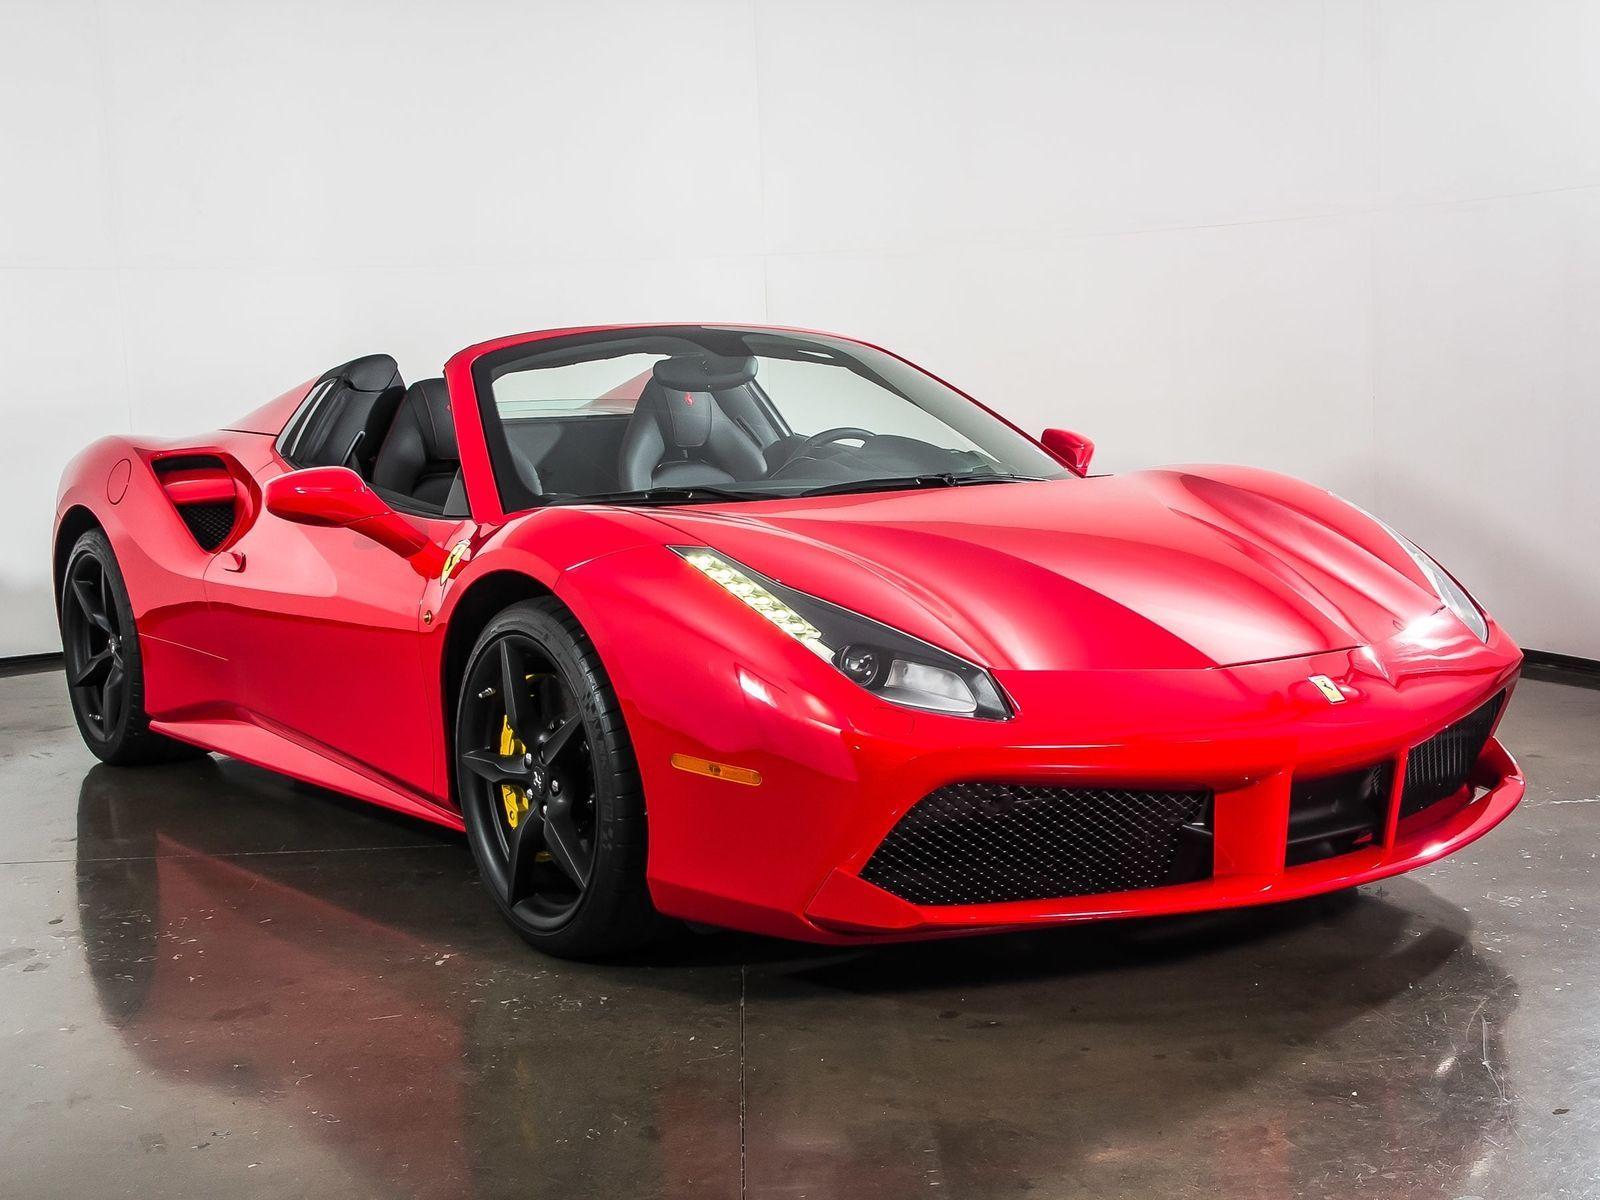 488 2016 Ferrari 488 Spider Only 1 098 Miles Rosso Corsa Convertible 329 900 00 329900 00 Cars Trucks Ferrari Price Ferrari